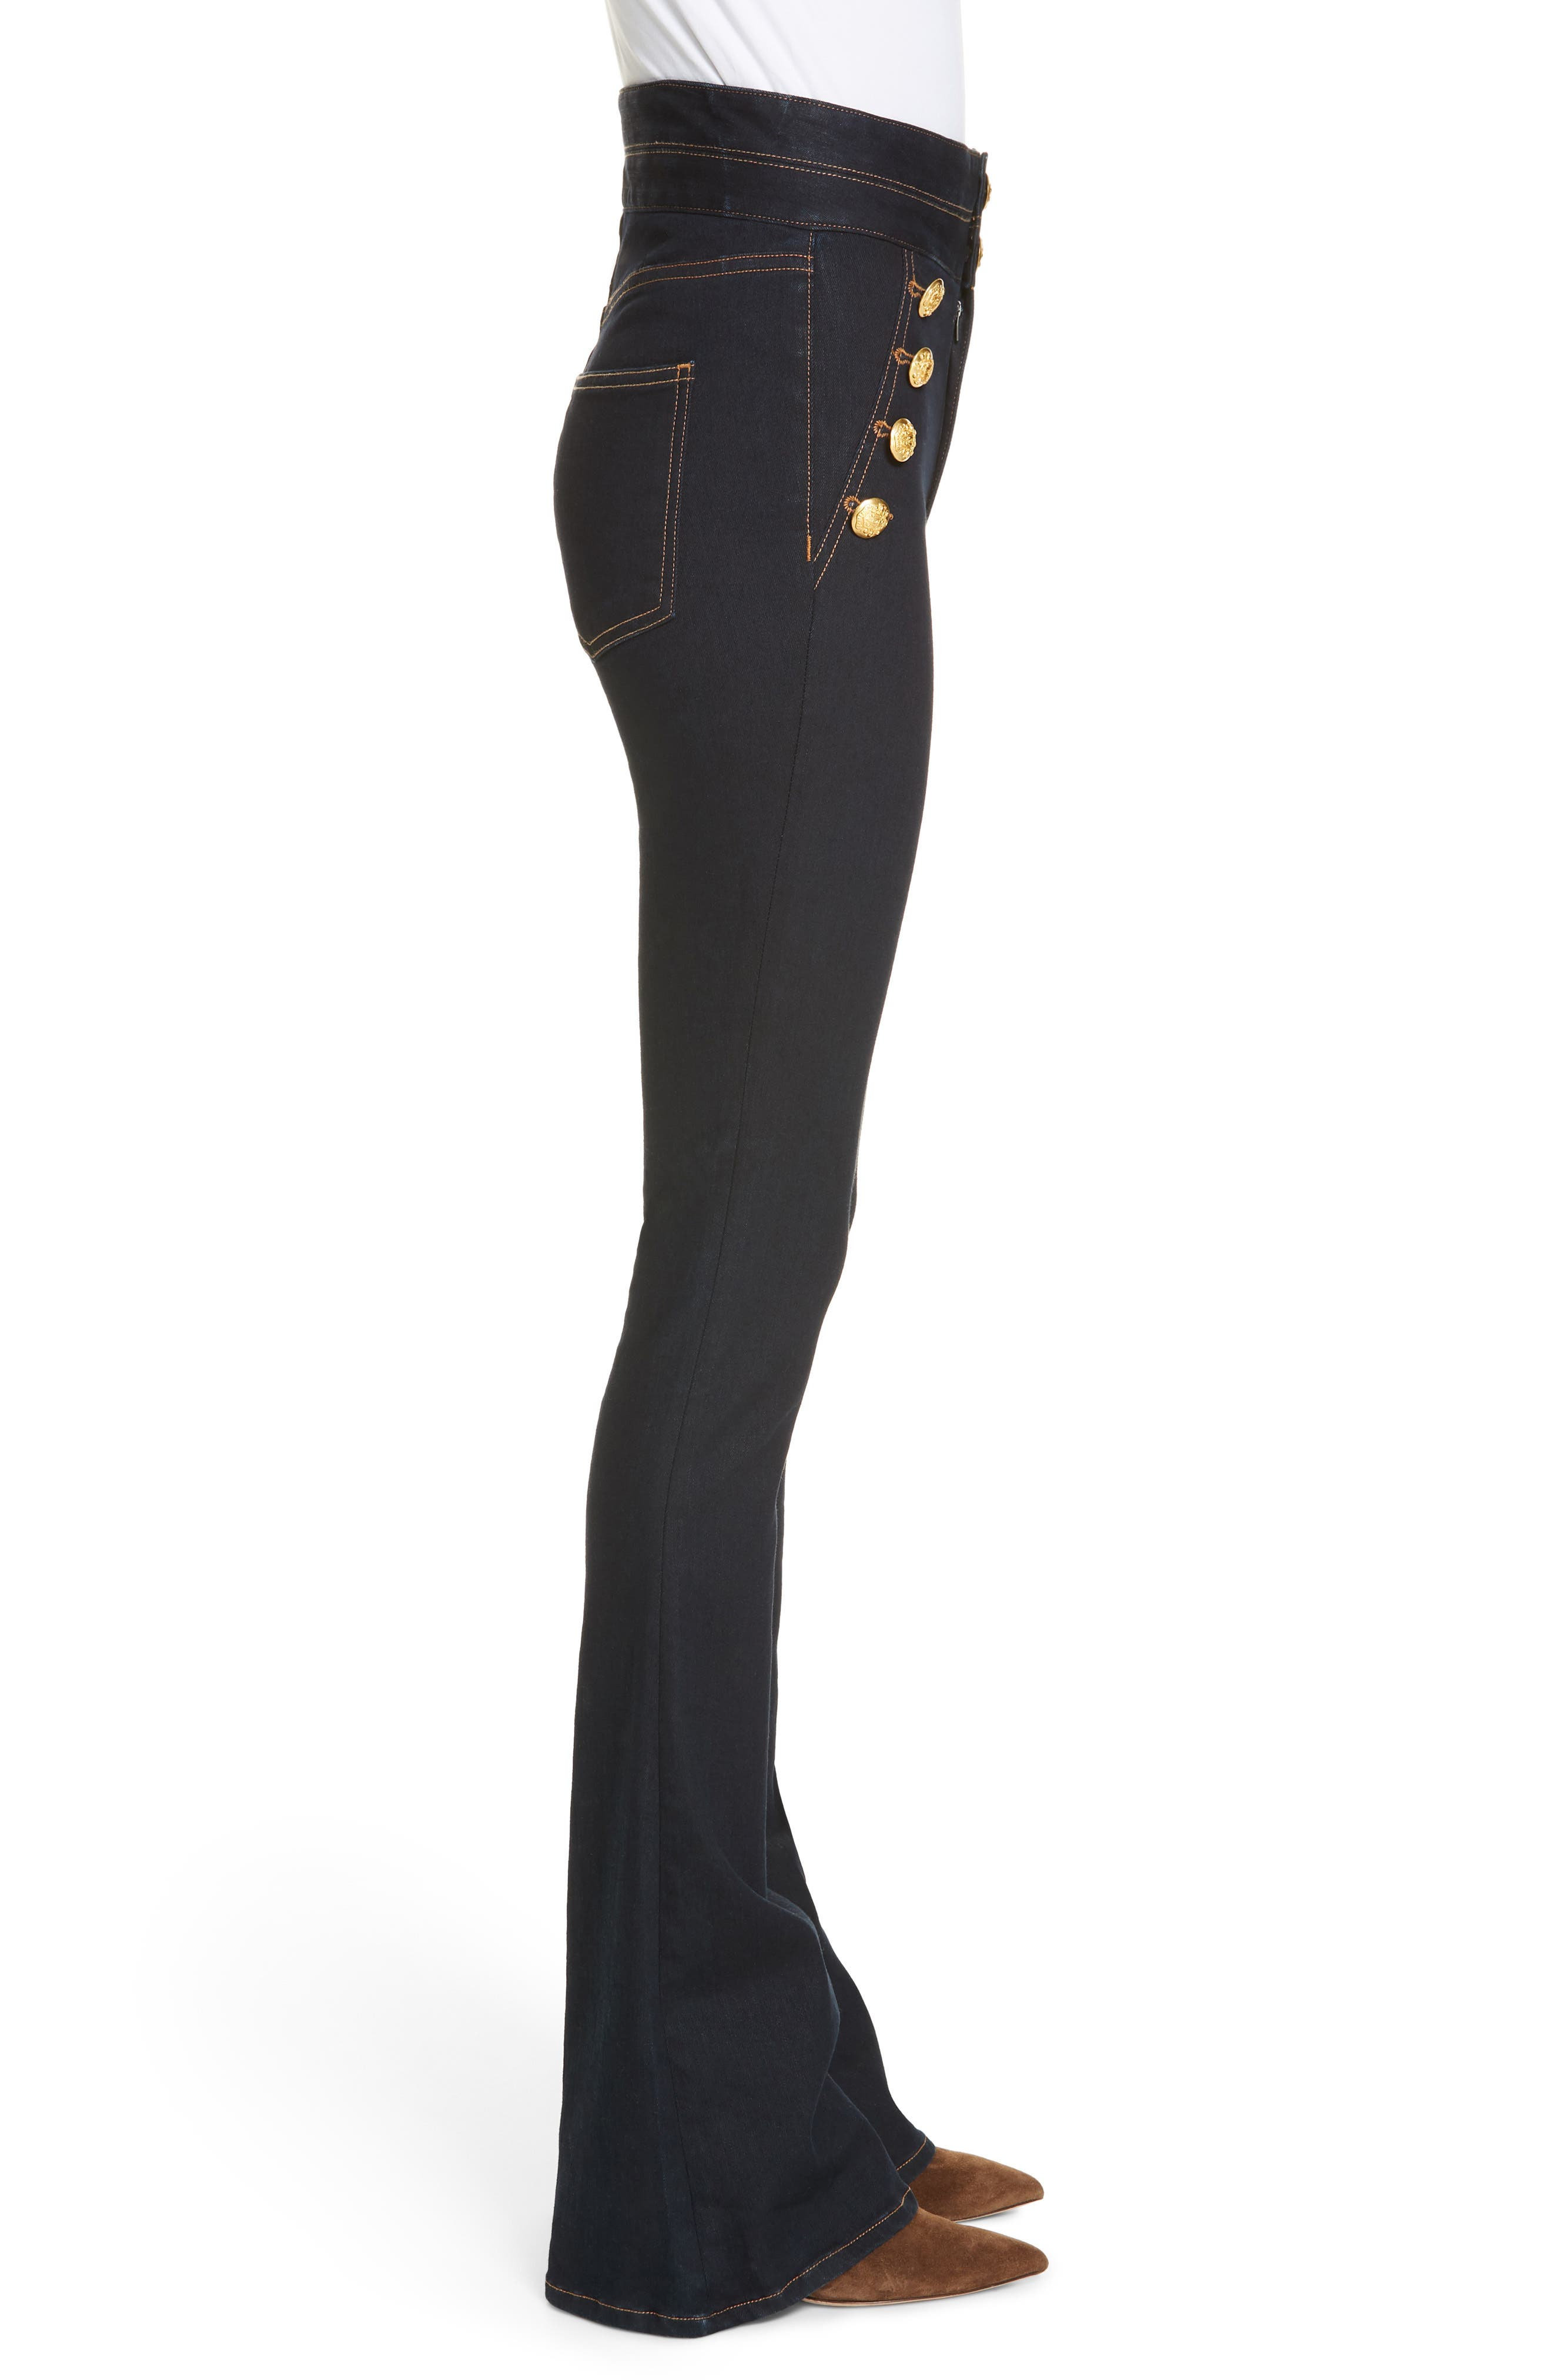 VERONICA BEARD, Dalida Button Detail Skinny Flare Jeans, Alternate thumbnail 3, color, INDIGO